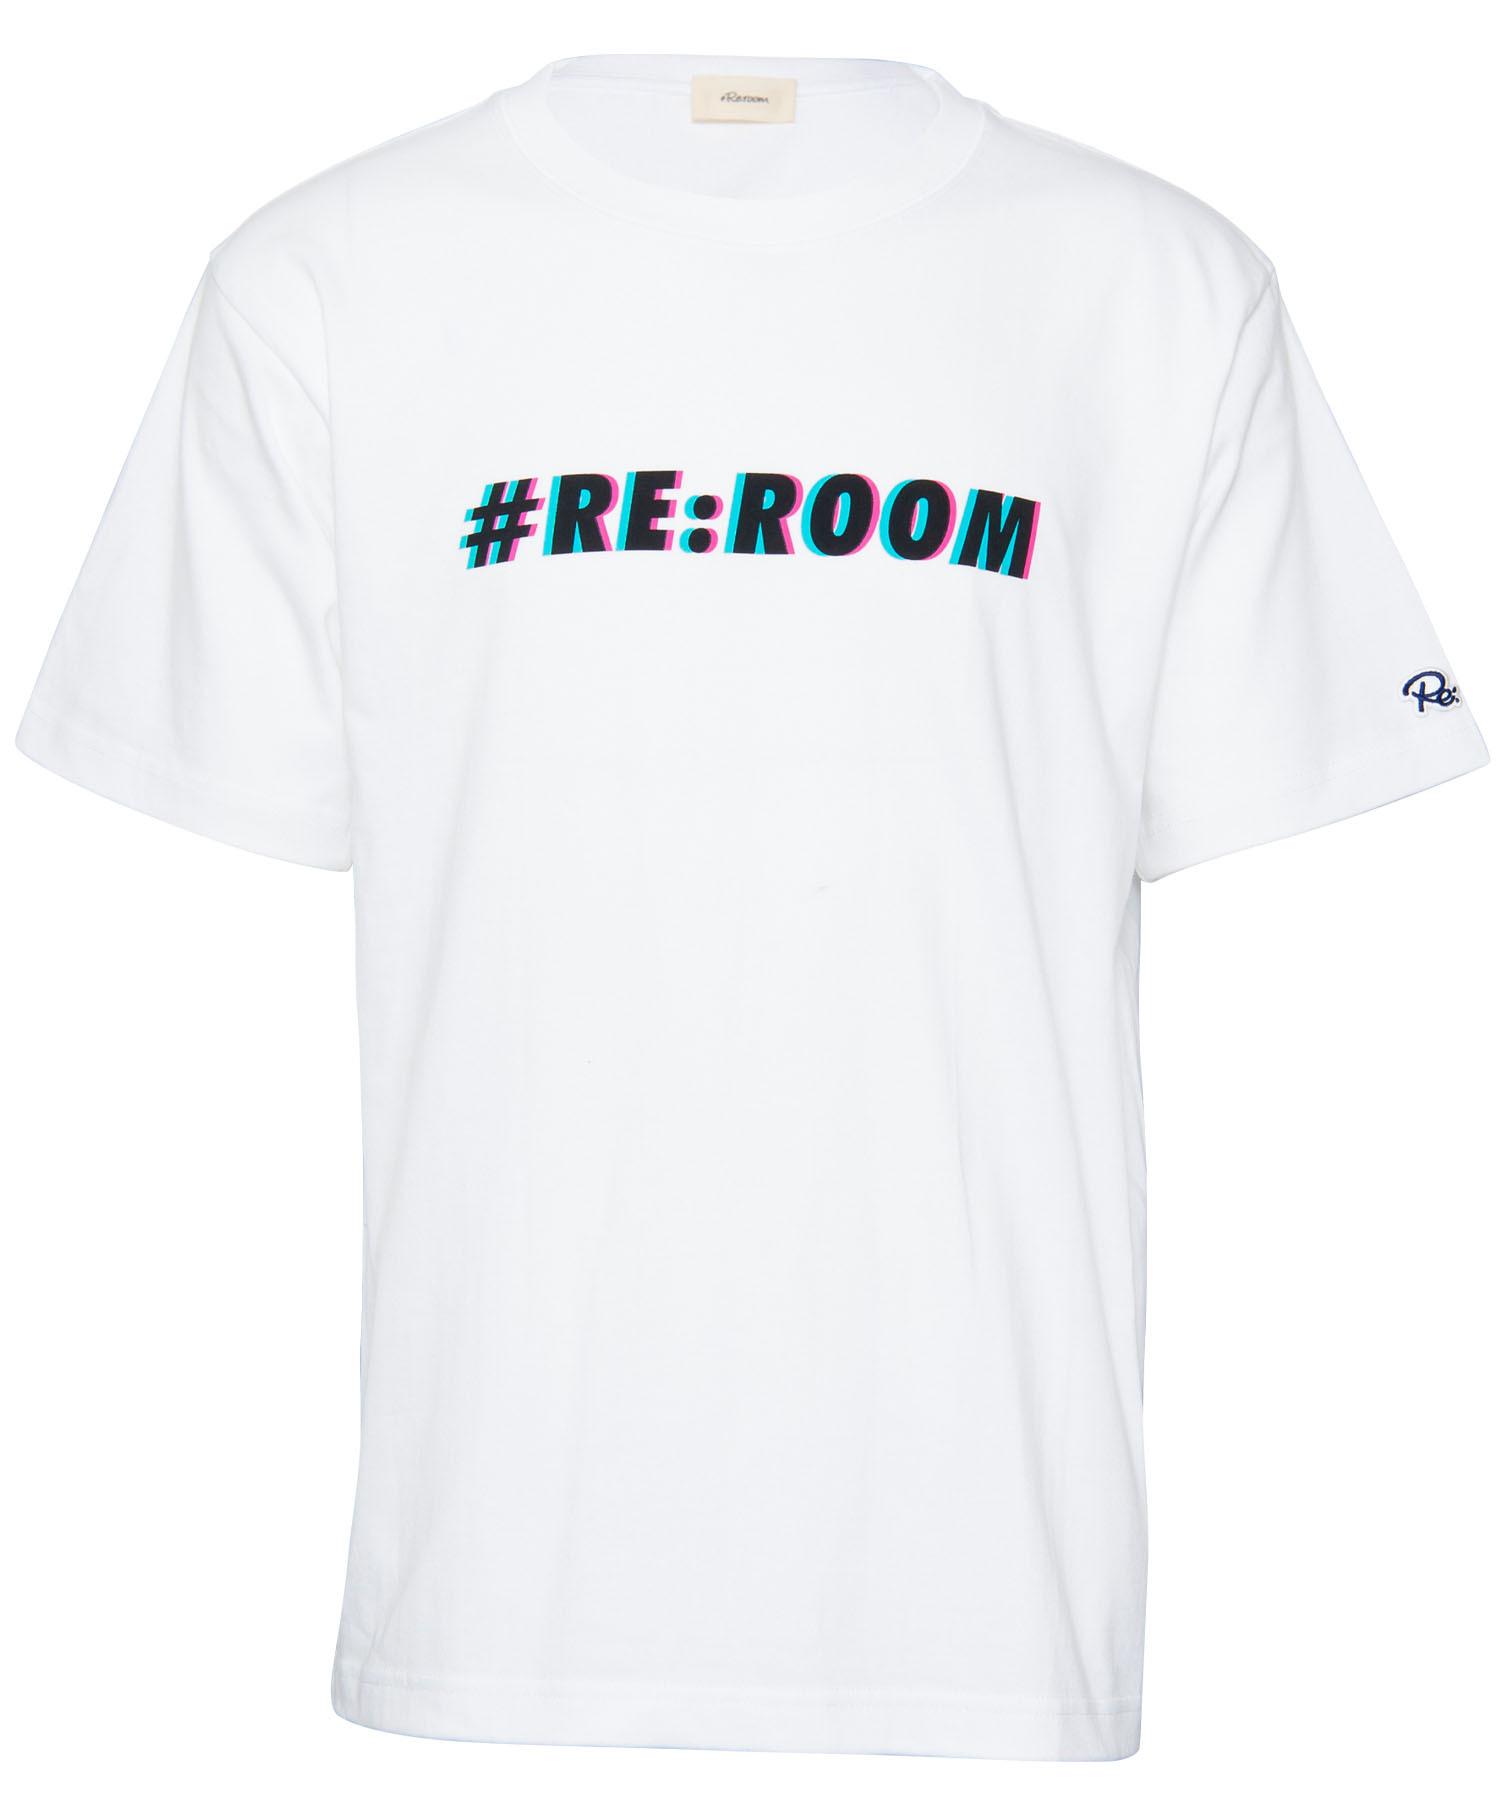 ANAGLYPH LOGO PRINT T-shirt[REC289]